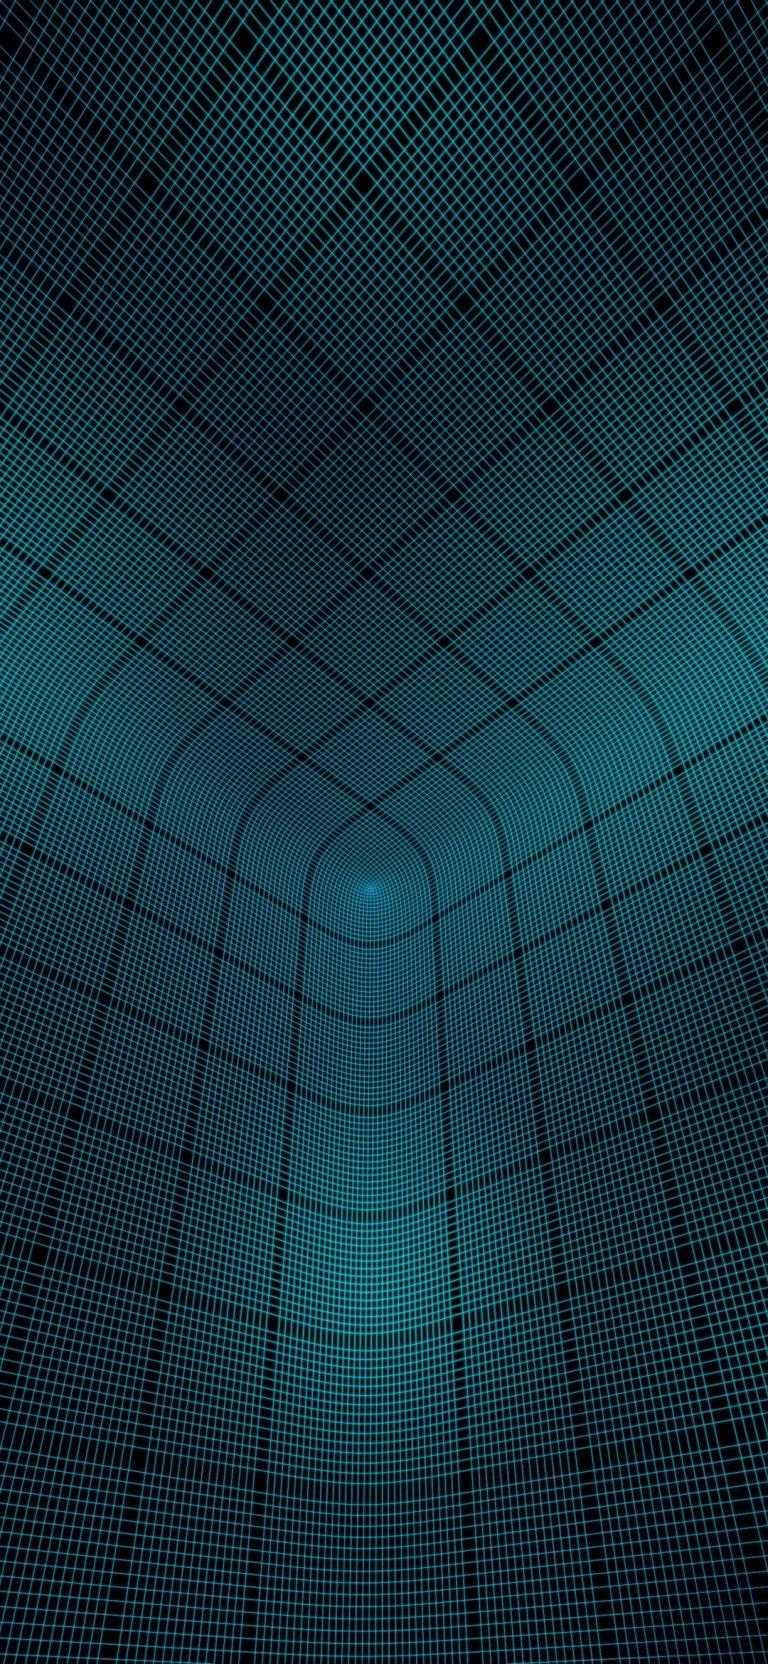 3D Phone Wallpaper 001 1080x2340 768x1664